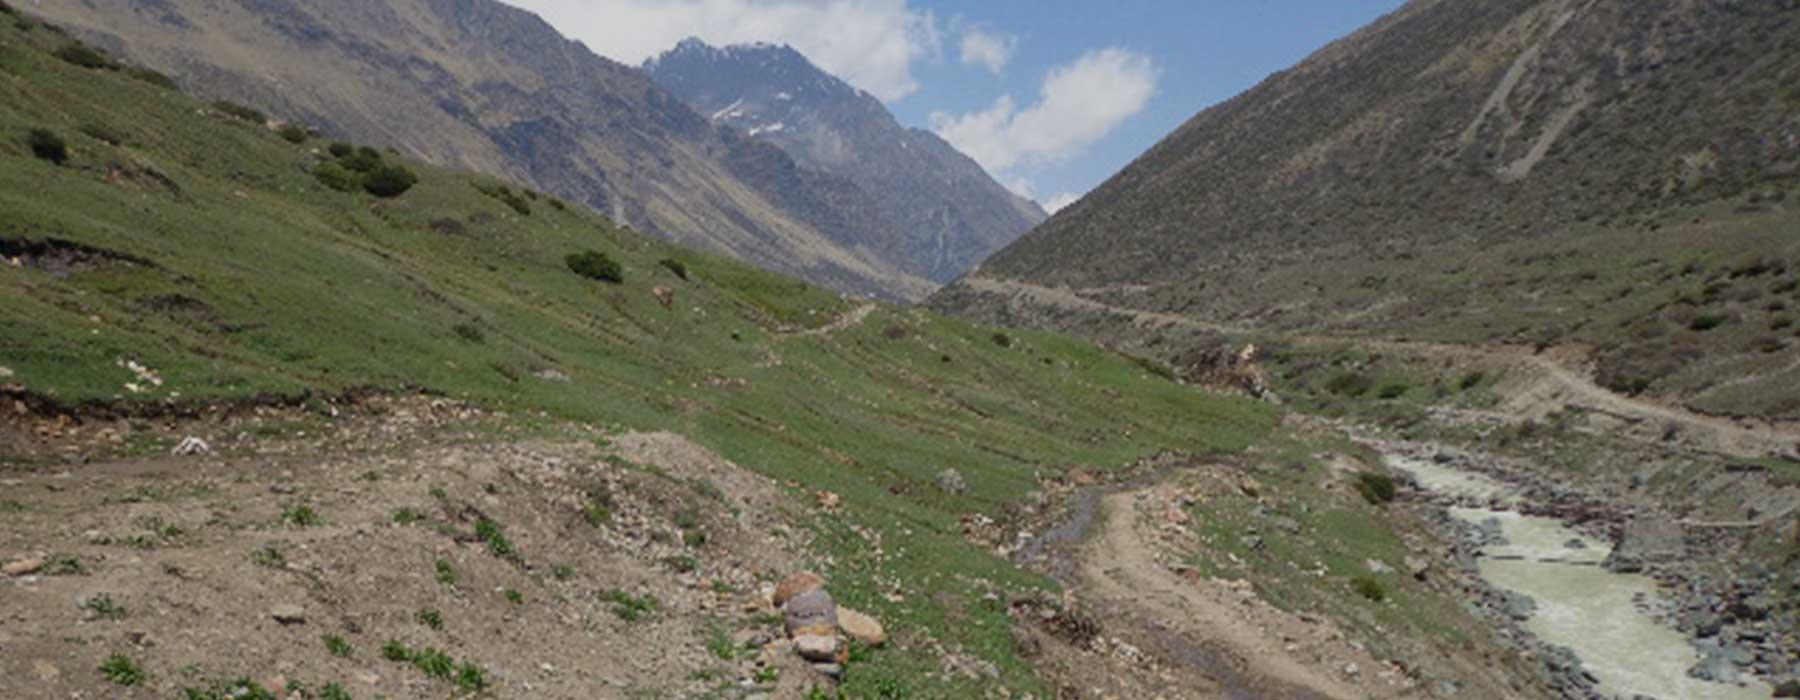 Milam Glacier Trekking Experience